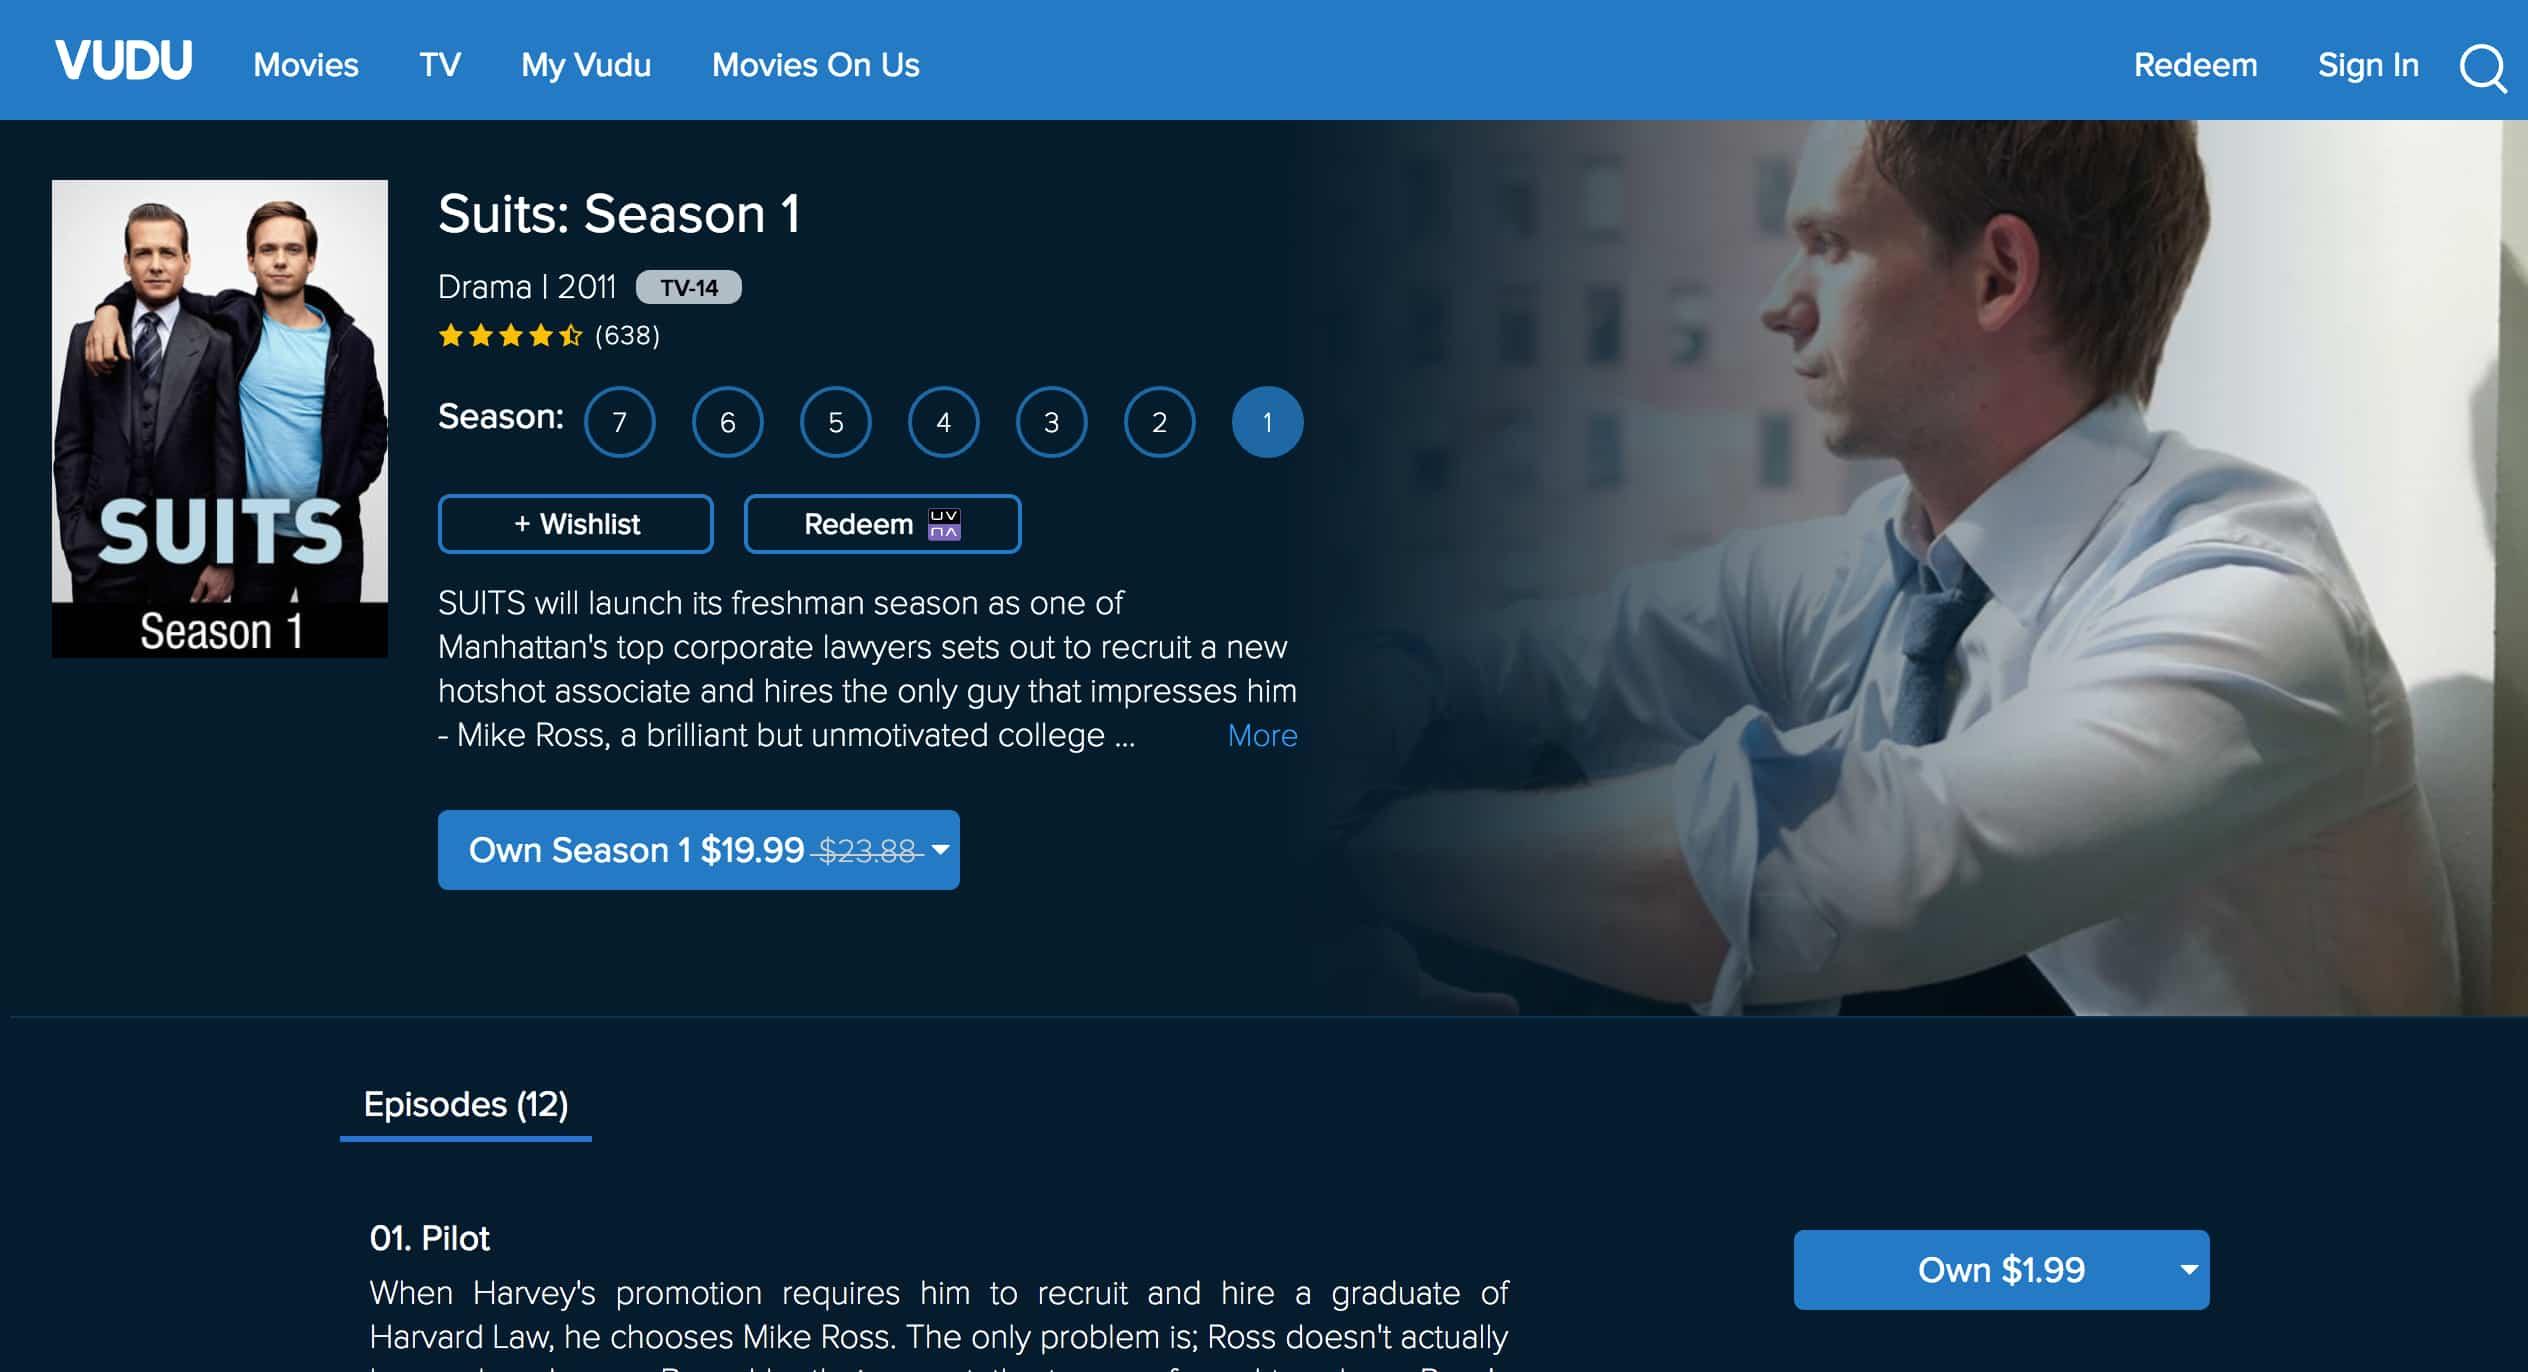 Vudu Suits Season 1 Watch Online